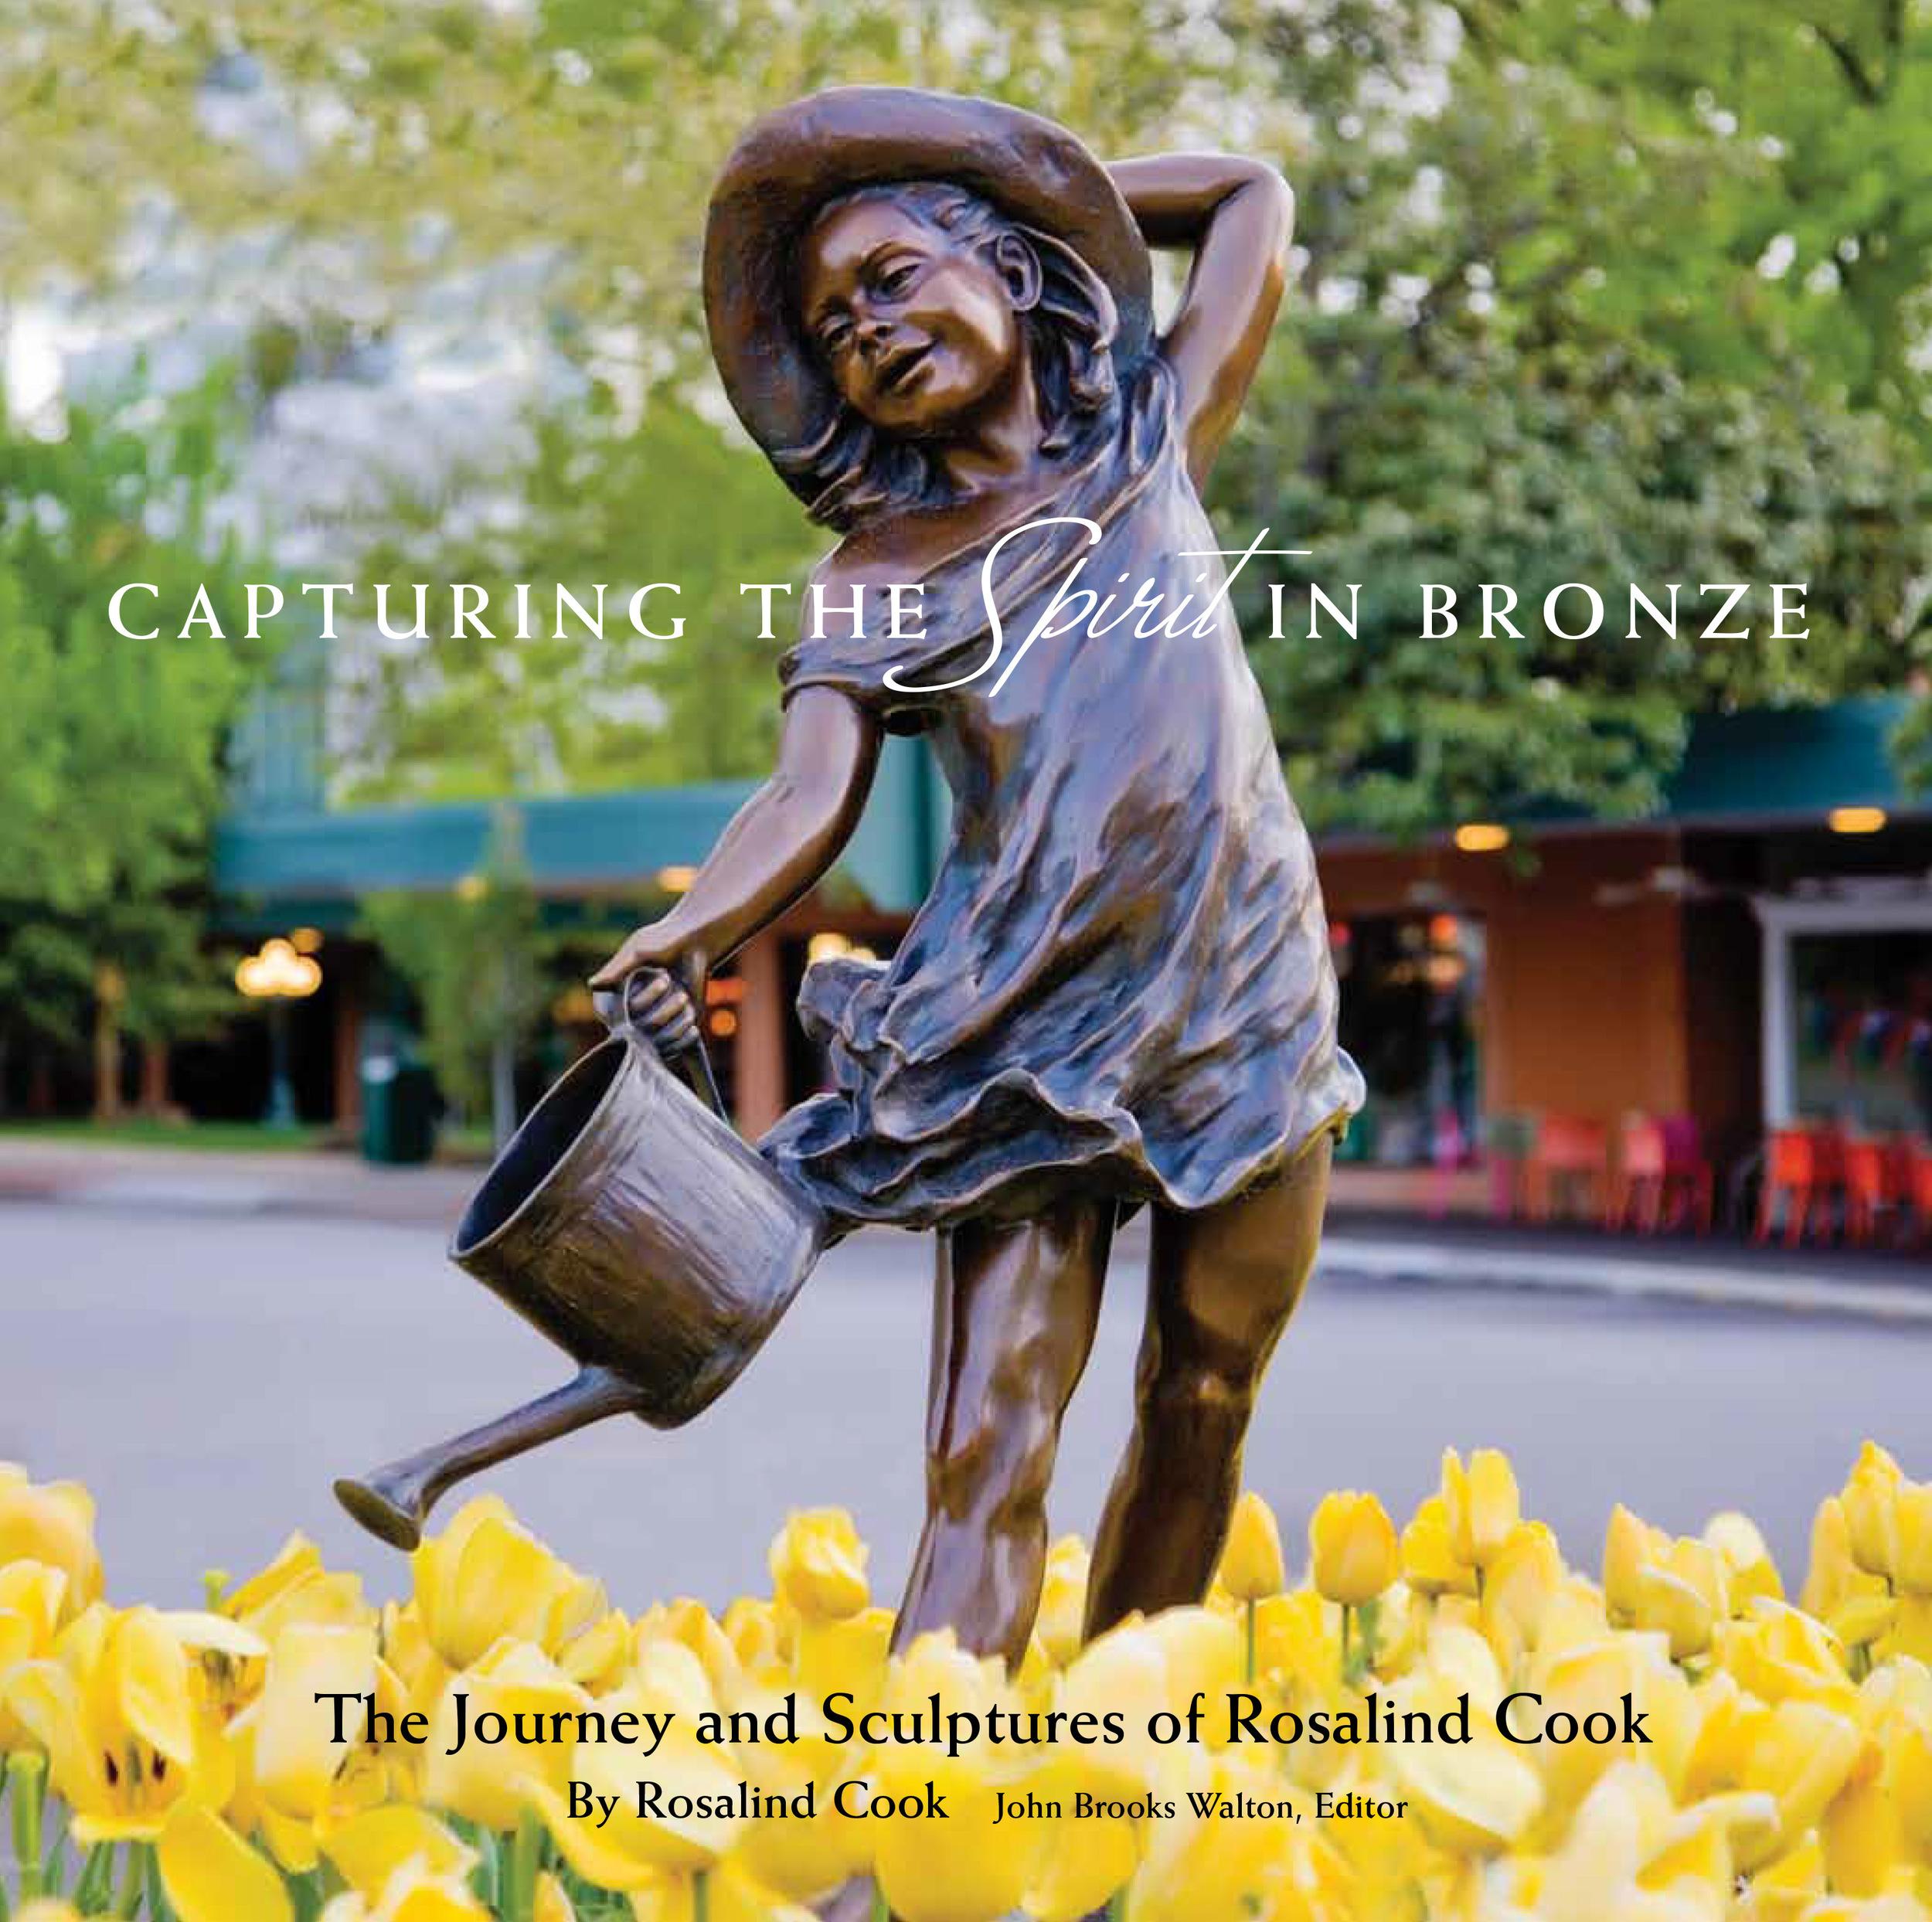 Book-Cover-rosalind-cook-lg.jpg